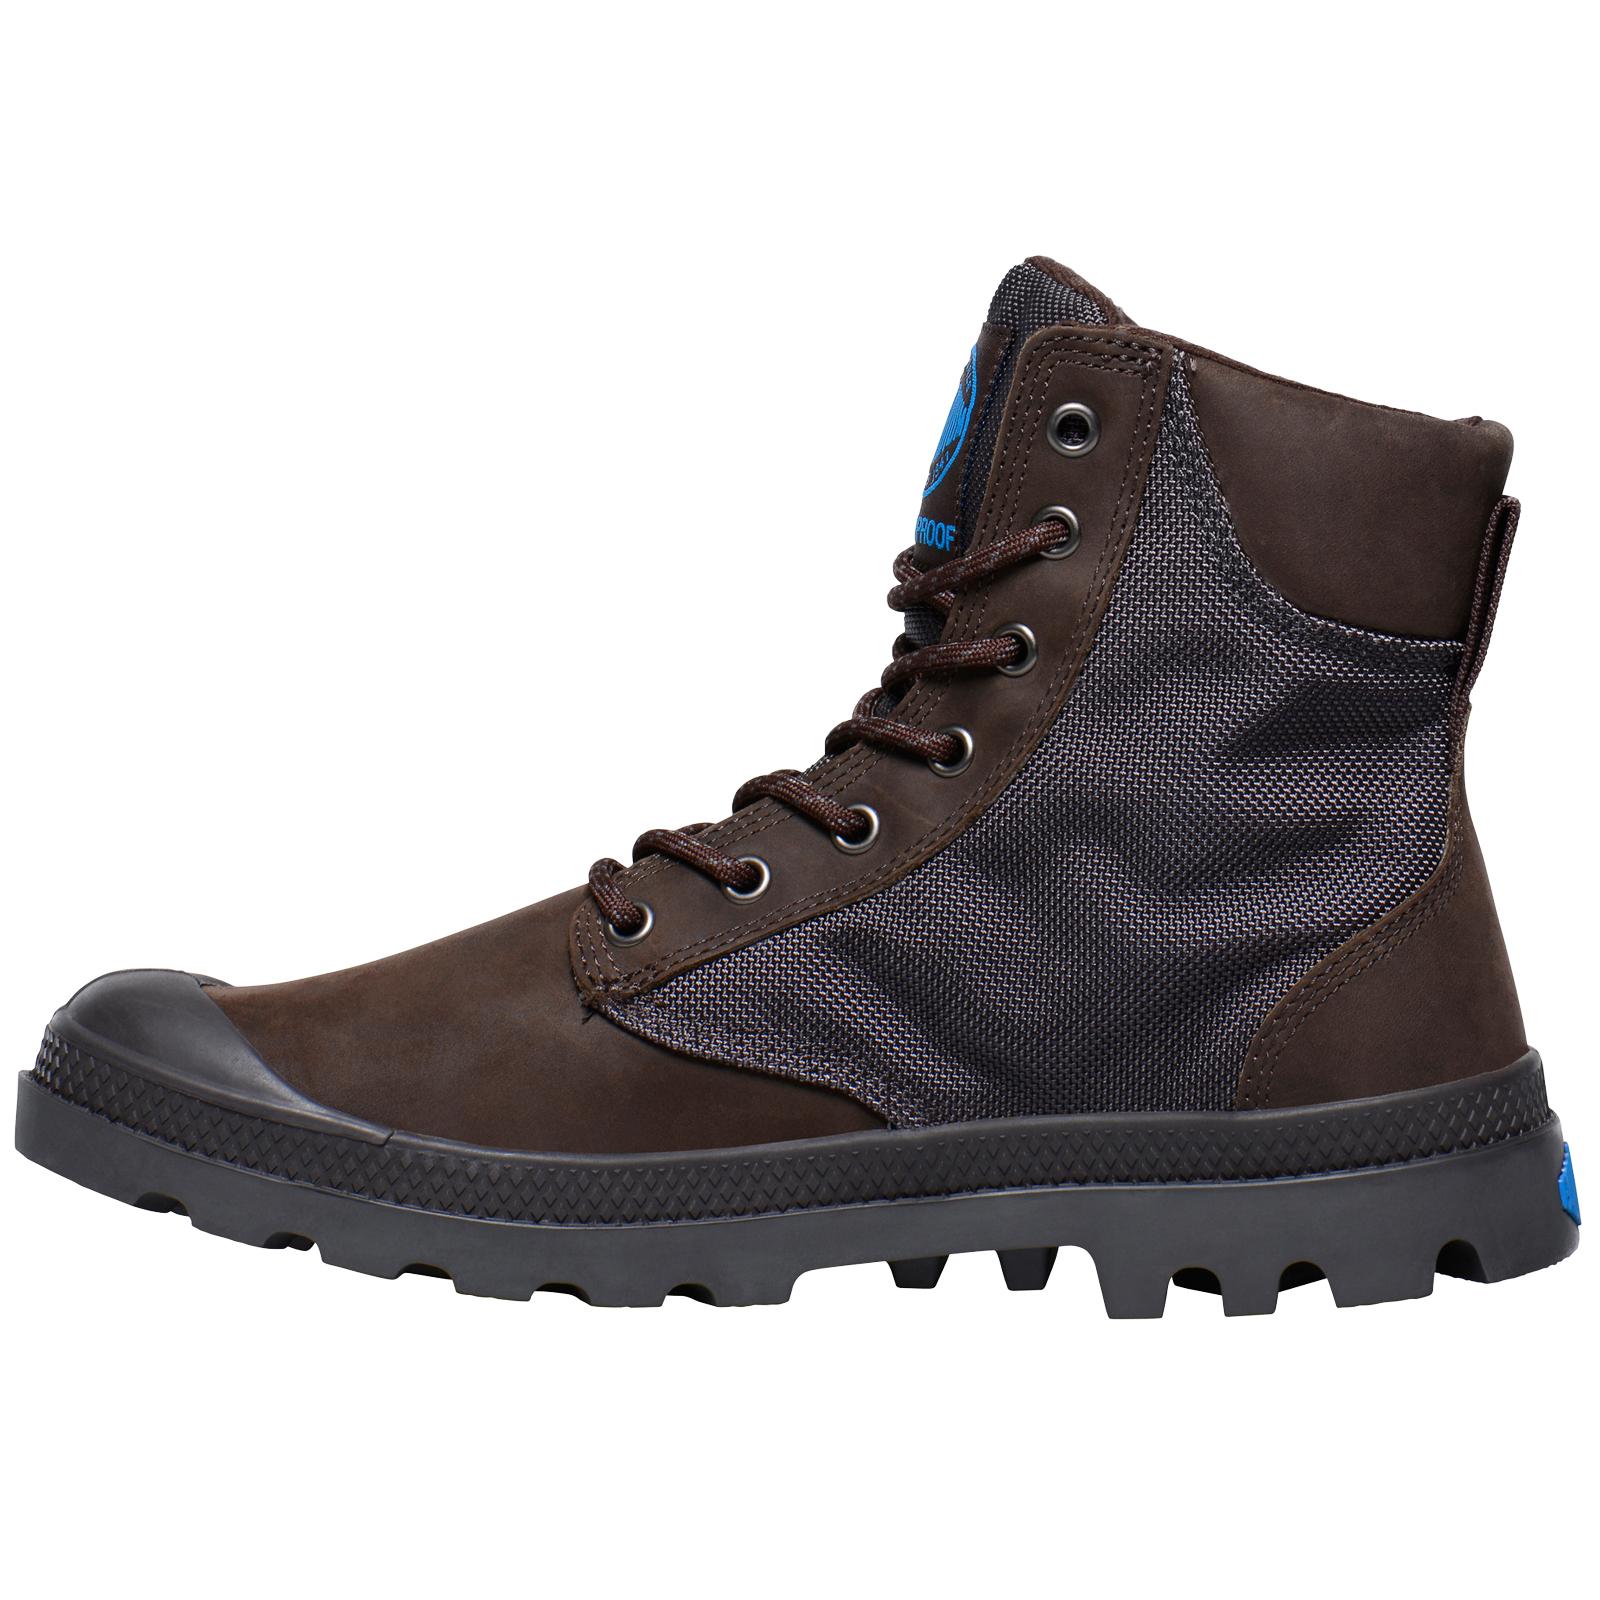 Palladium-Pampa-Sport-Mens-Shoes-Womens-Waterproof-Walking-High-Top-Ankle-Boots thumbnail 26